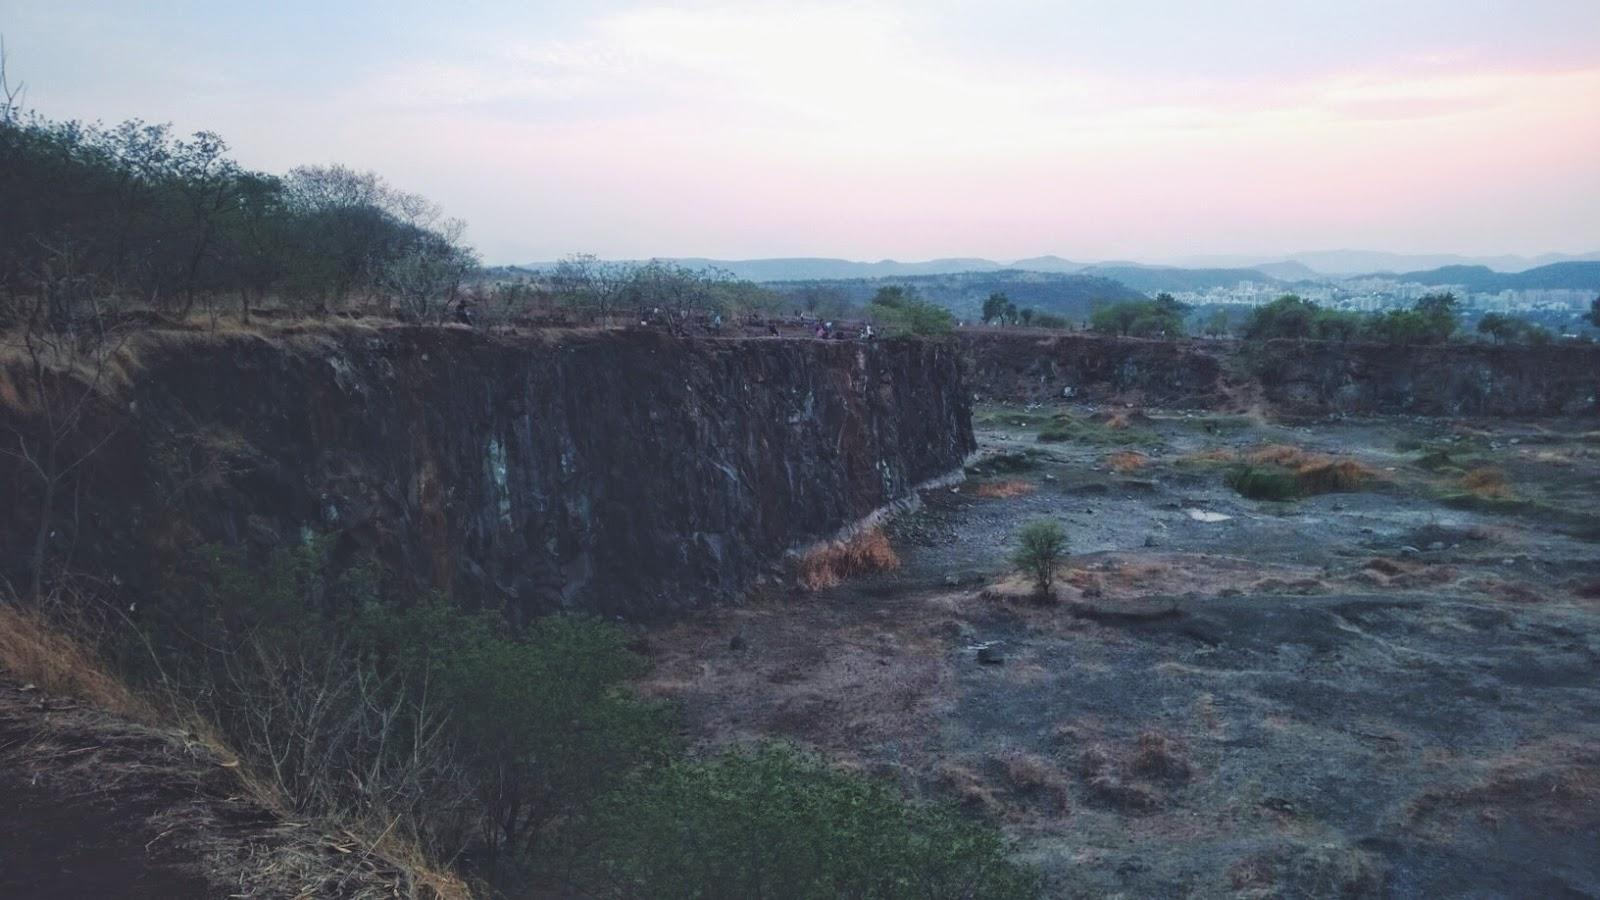 Vetal Hill - Pune Image